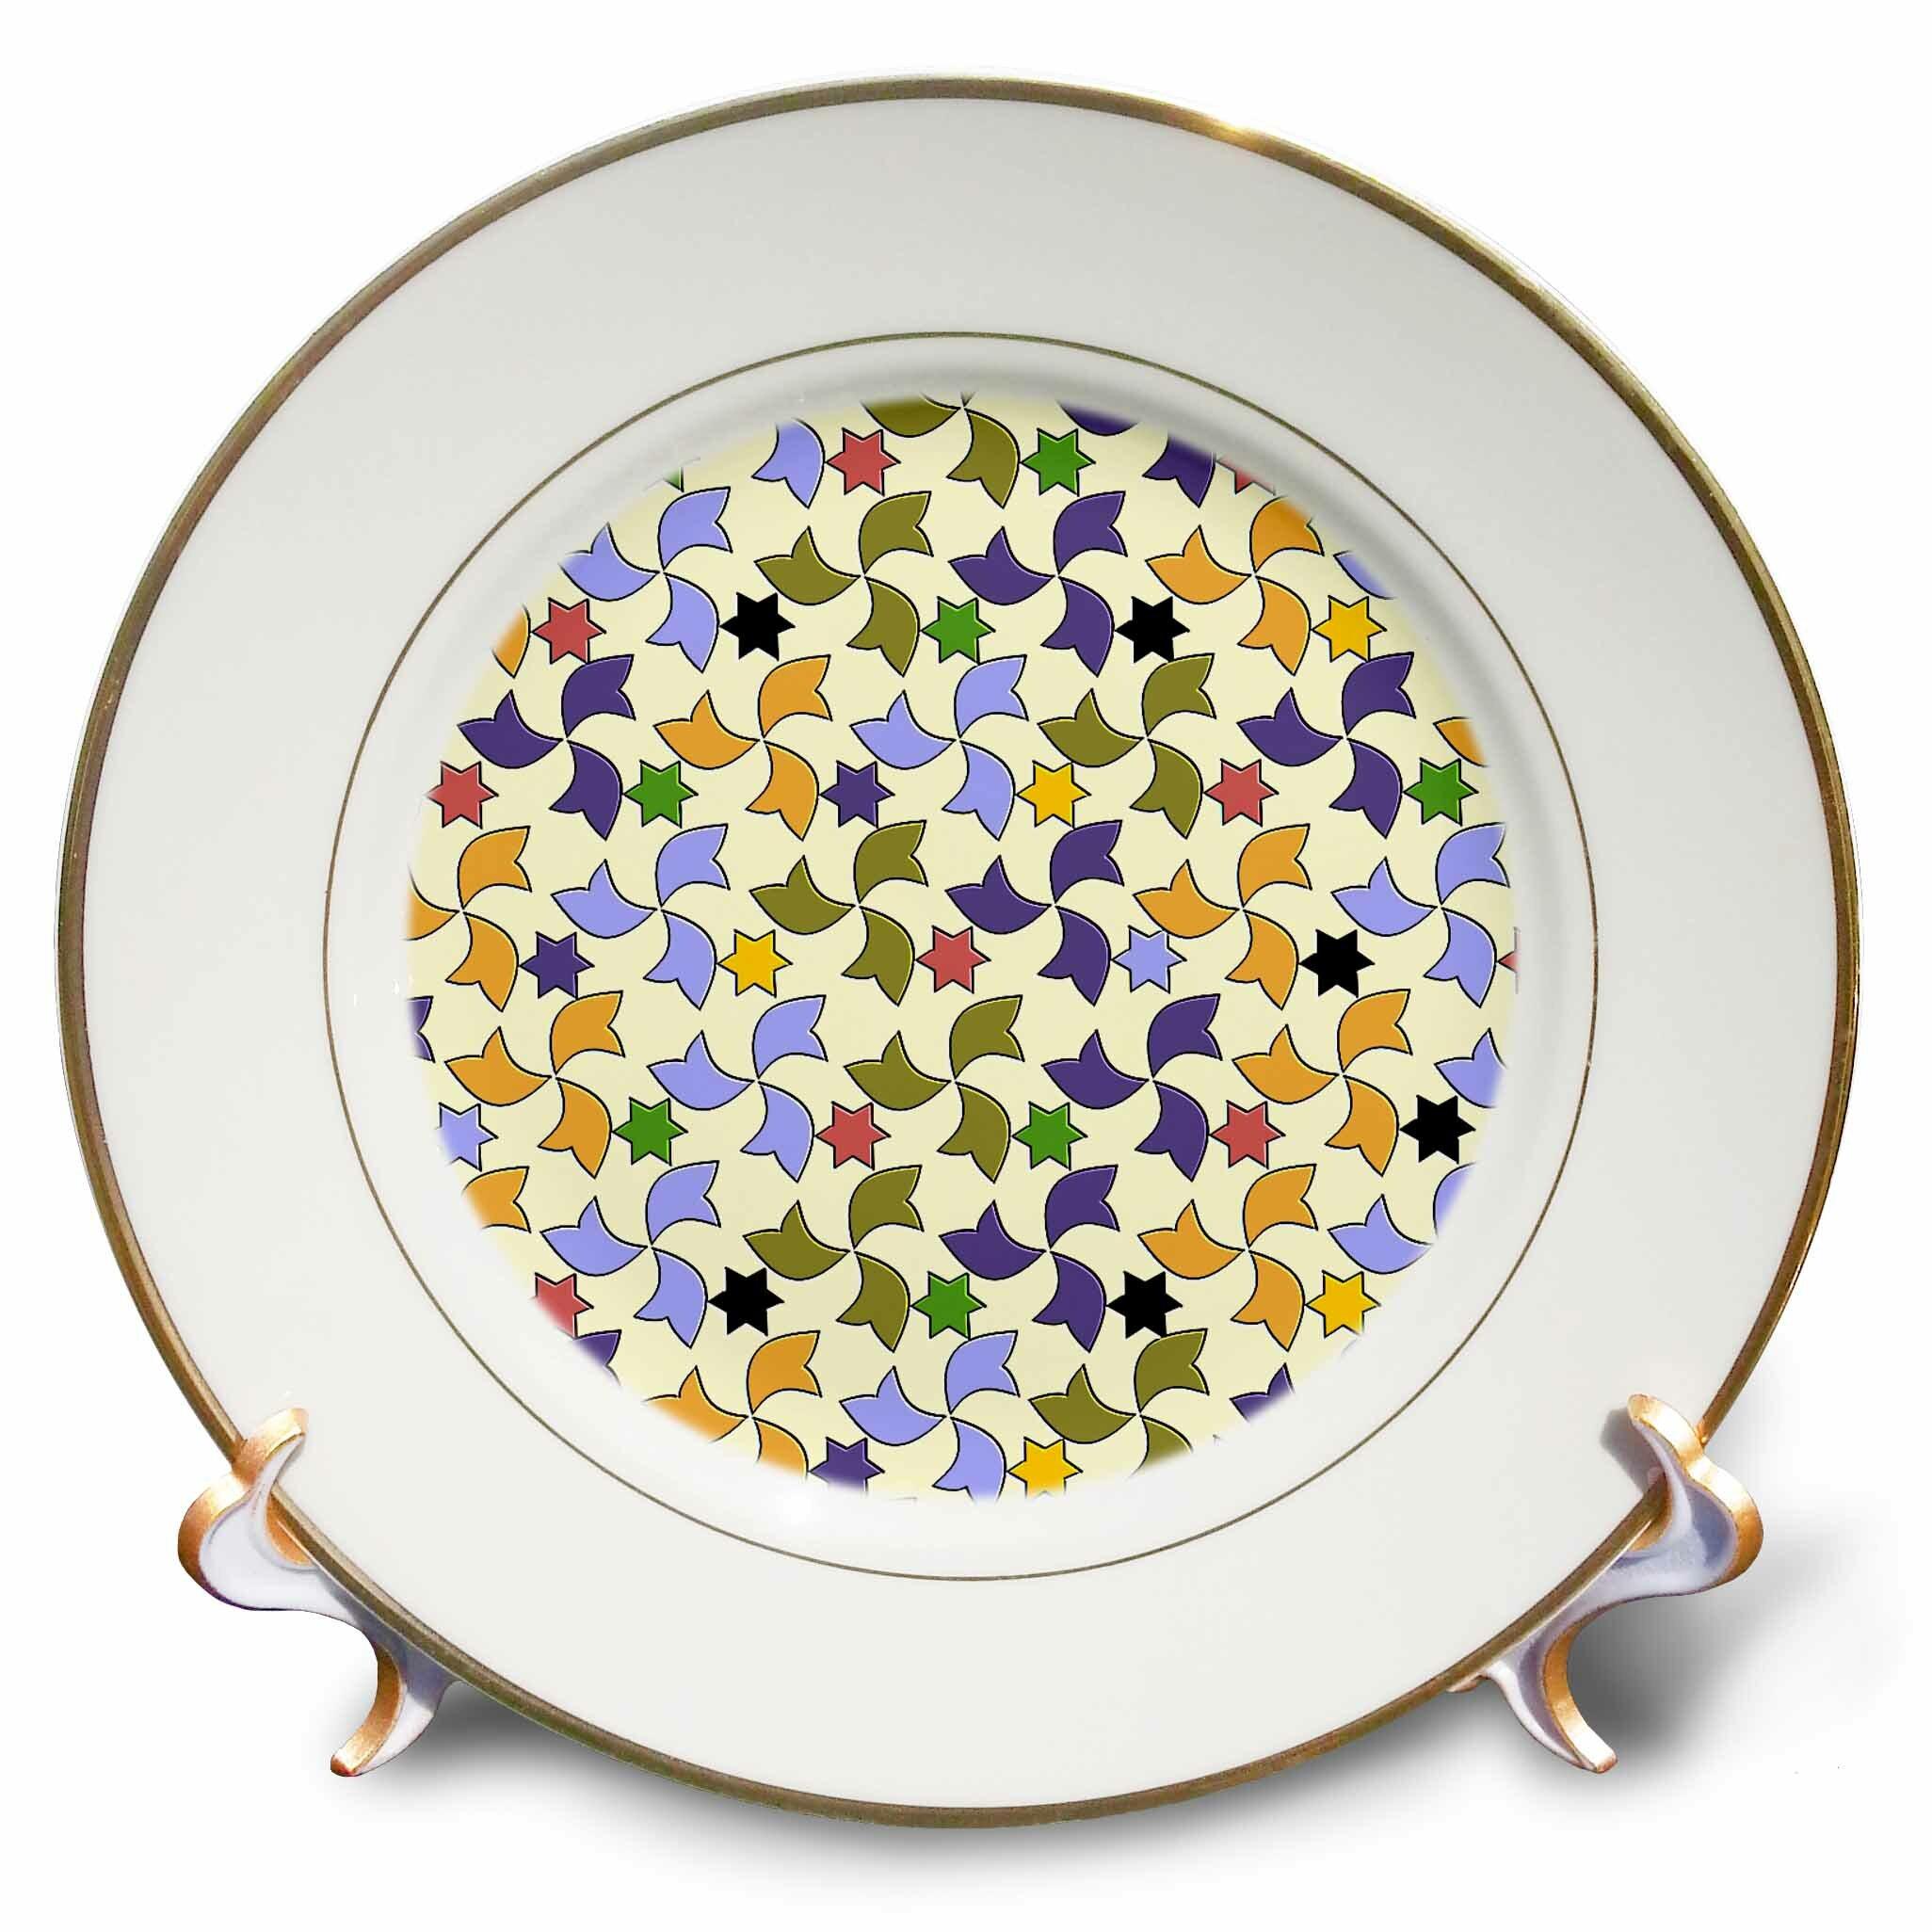 Transformation Palette En Jardiniere spanish windmills and stars geometric mosaic pattern porcelain decorative  plate